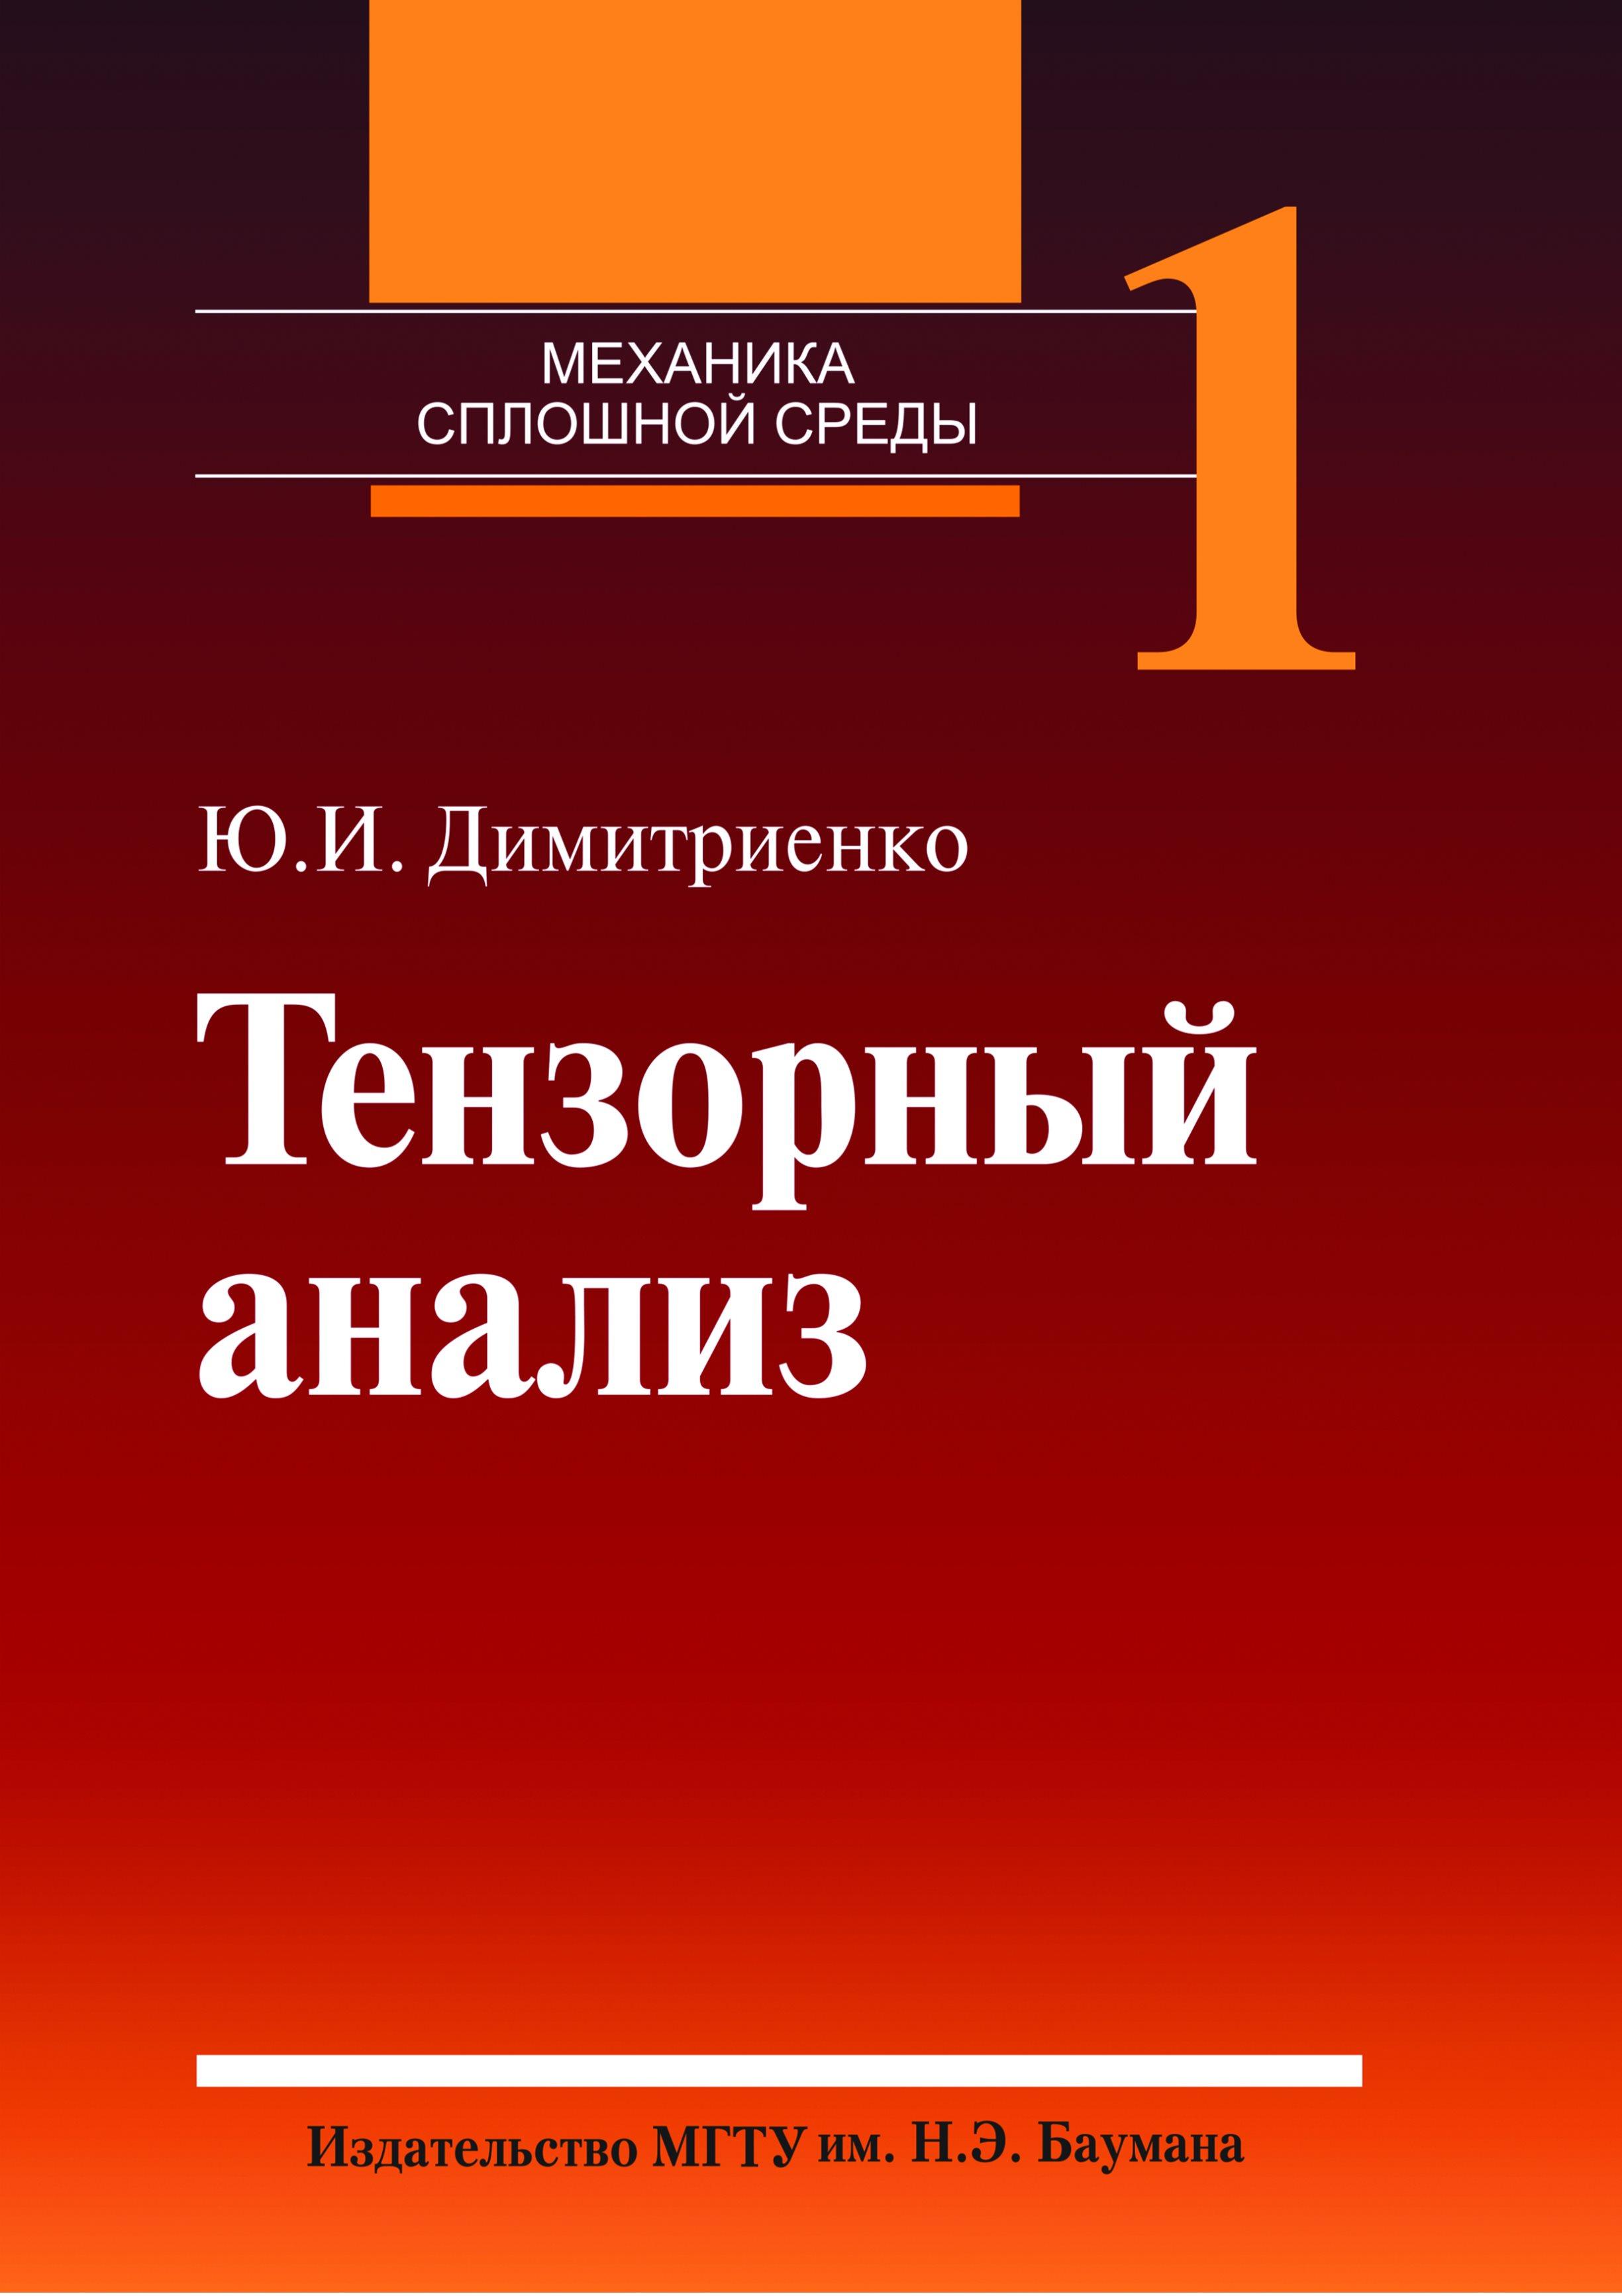 Юрий Дмитриенко Тензорный анализ. Том 1 юрий дмитриенко тензорный анализ том 1